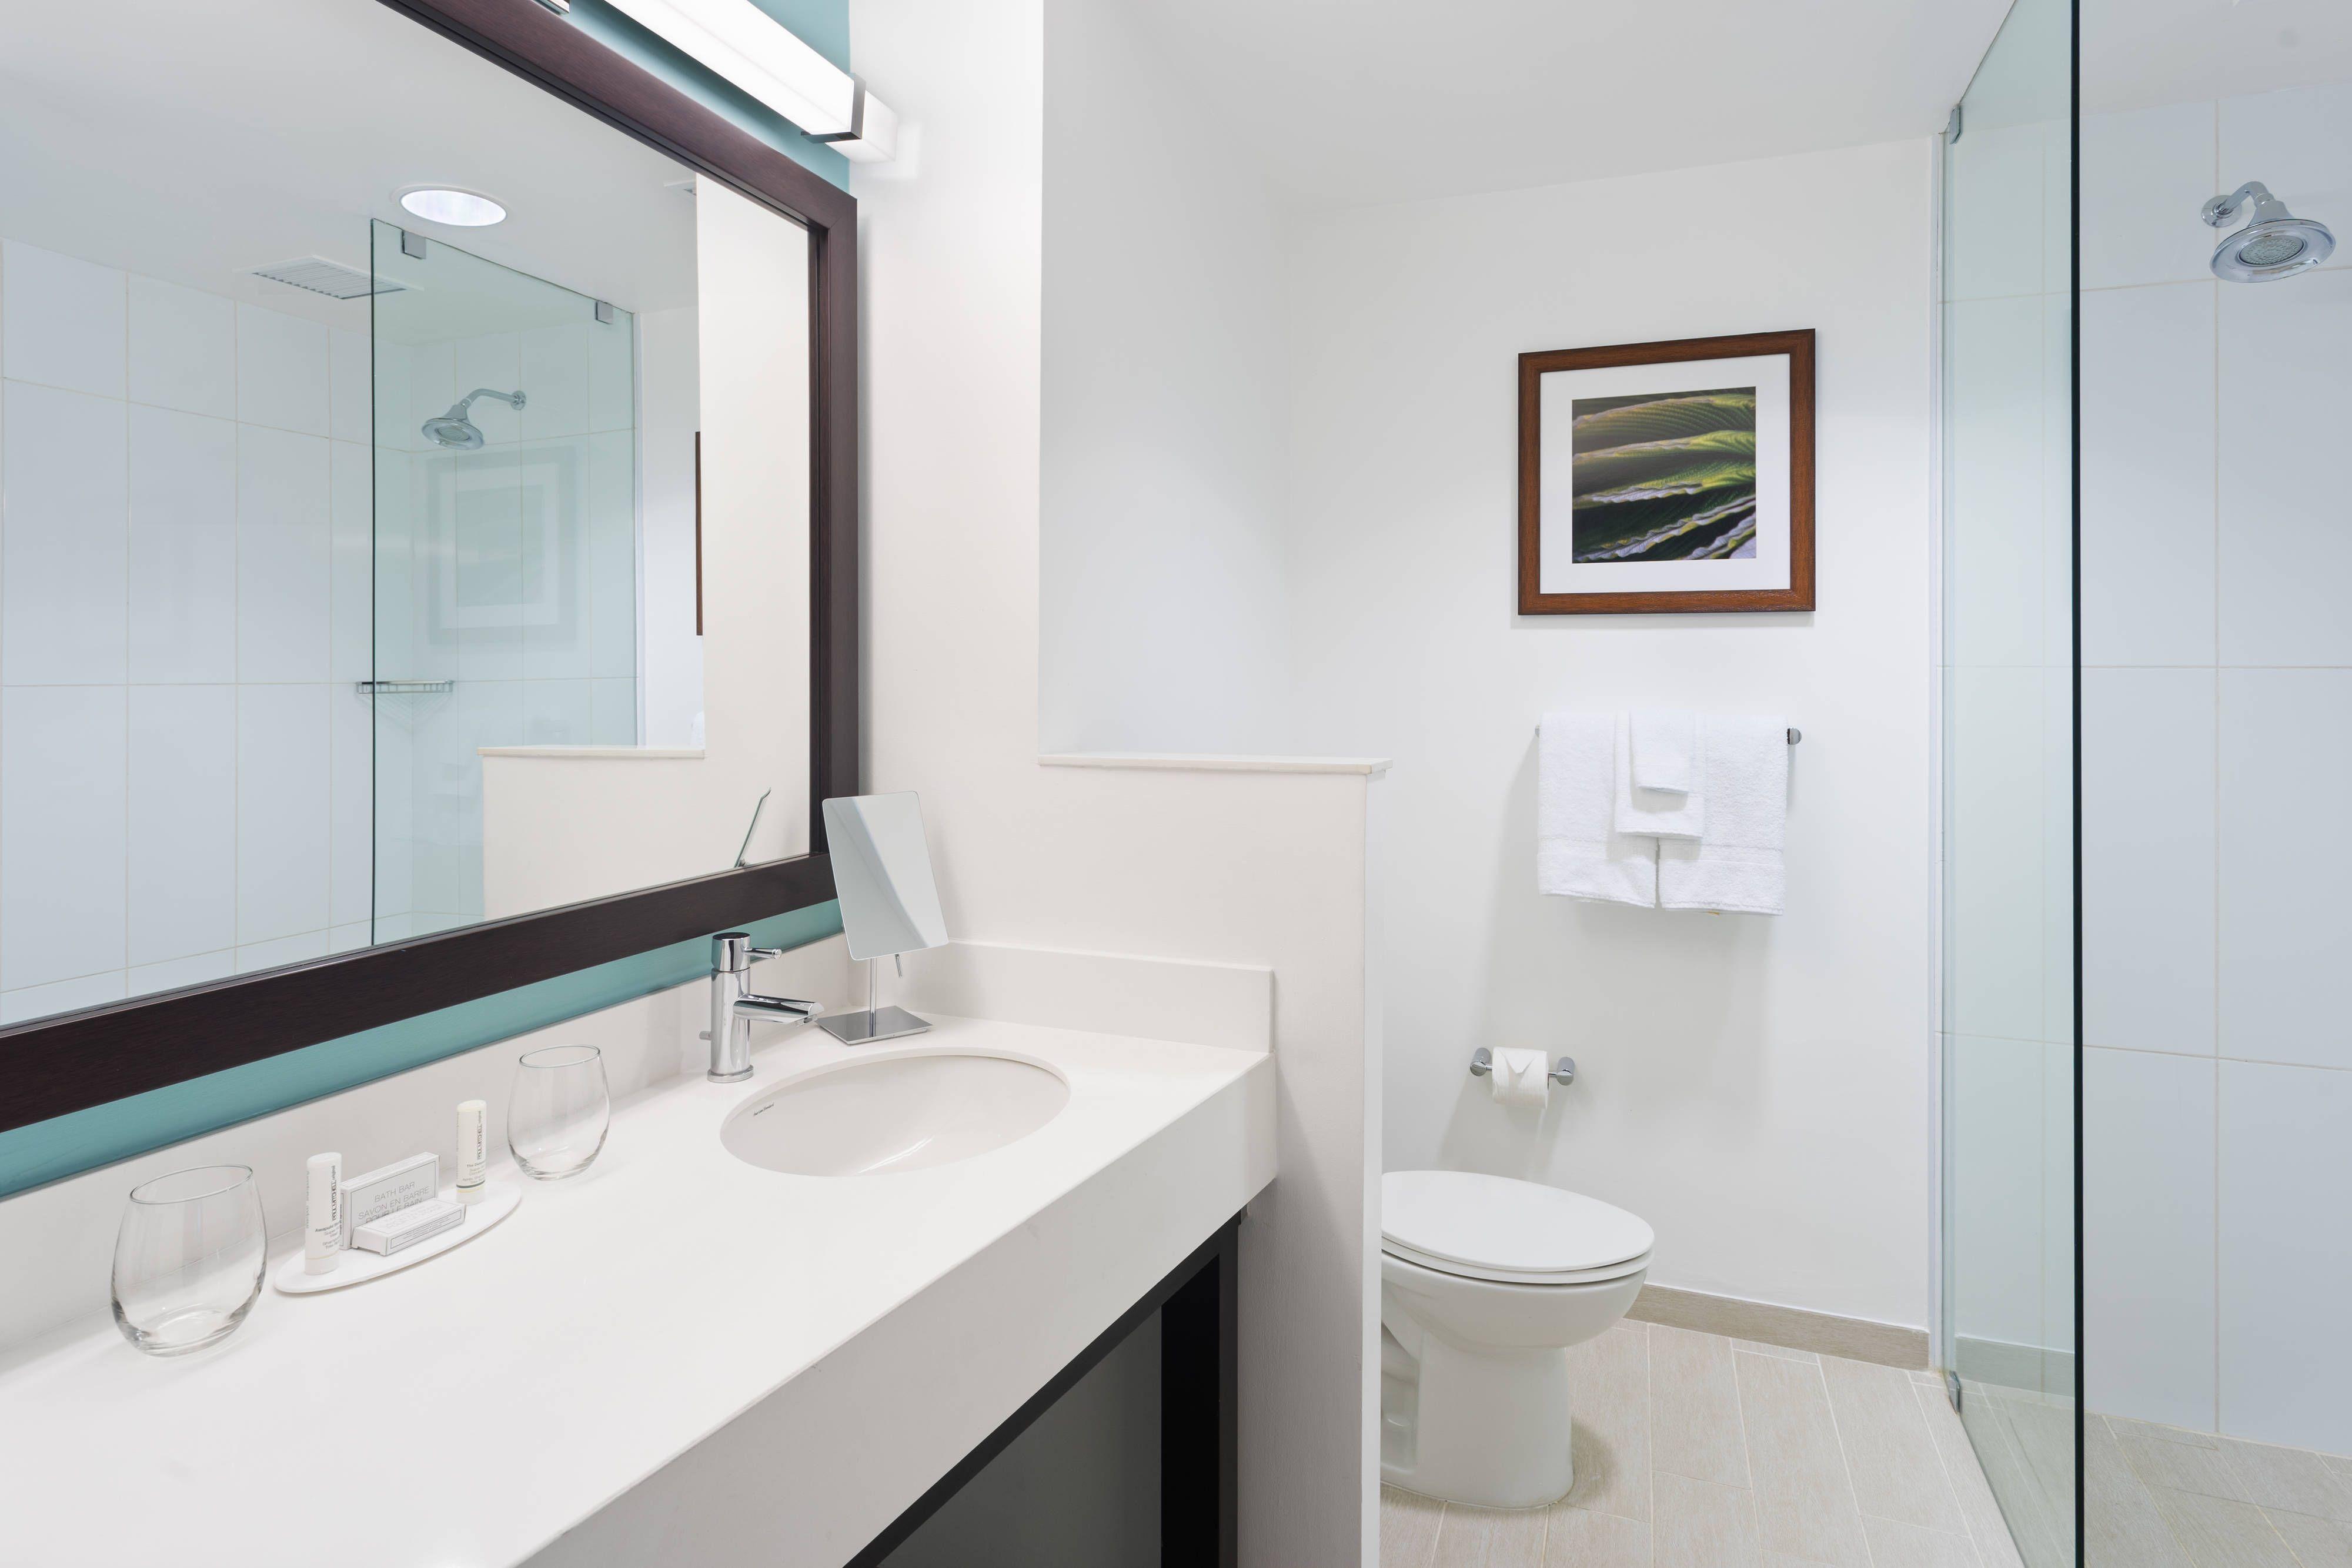 Courtyard Kingston Jamaica Guest Bathroom Traveling Beautiful Rooms Guest Bathroom Framed Bathroom Mirror Courtyard